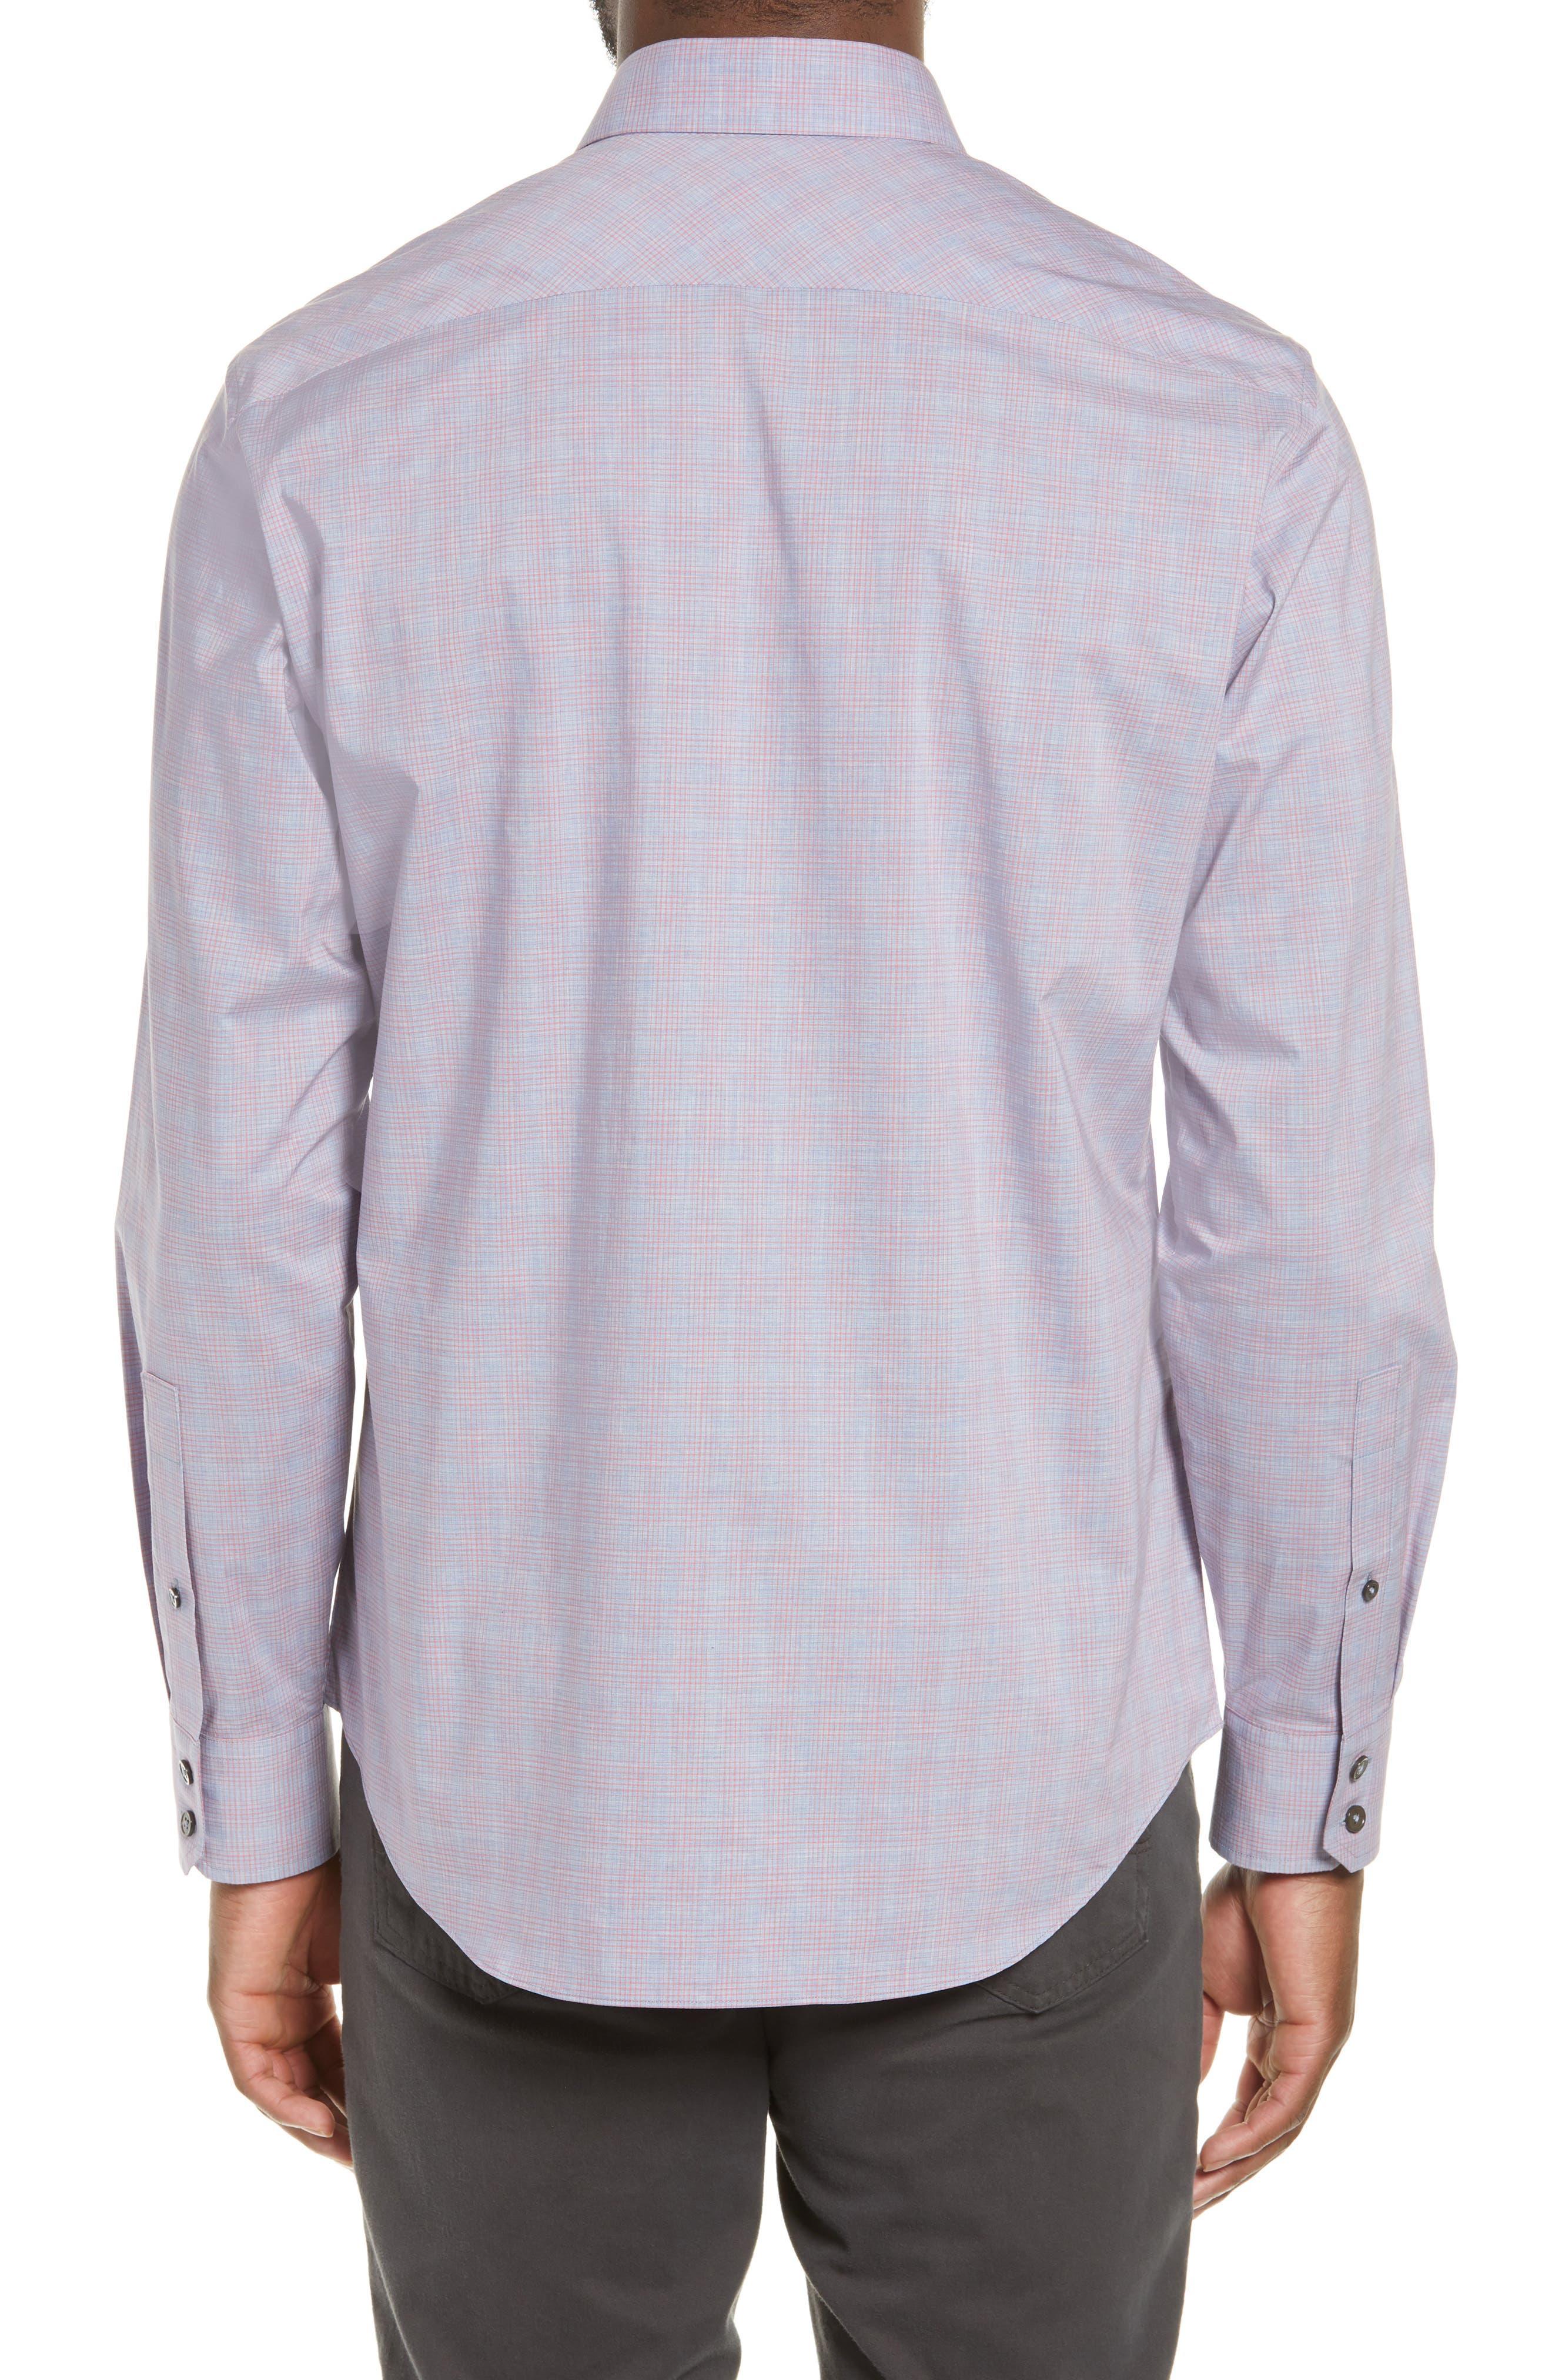 ZACHARY PRELL, Buckland Regular Fit Sport Shirt, Alternate thumbnail 3, color, FLAMINGO